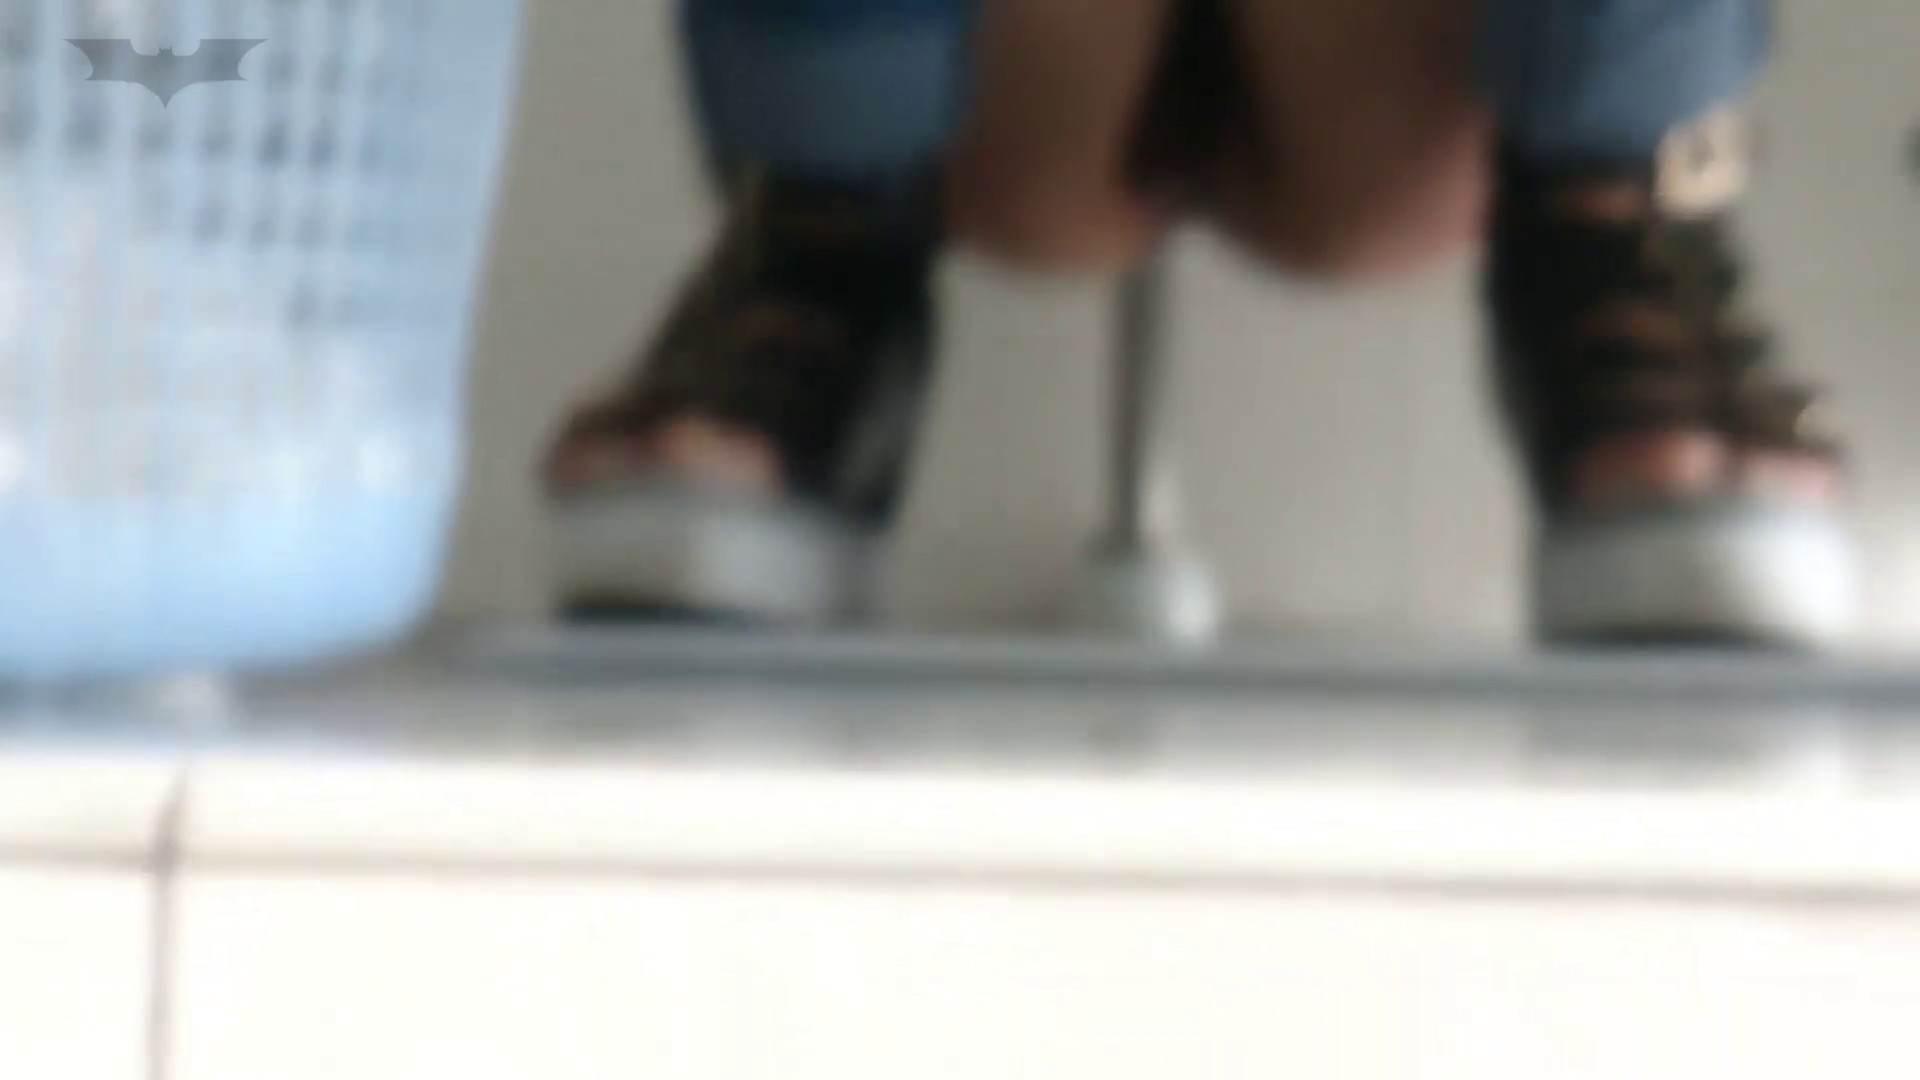 JD盗撮 美女の洗面所の秘密 Vol.37 洗面所のぞき AV無料動画キャプチャ 112枚 47